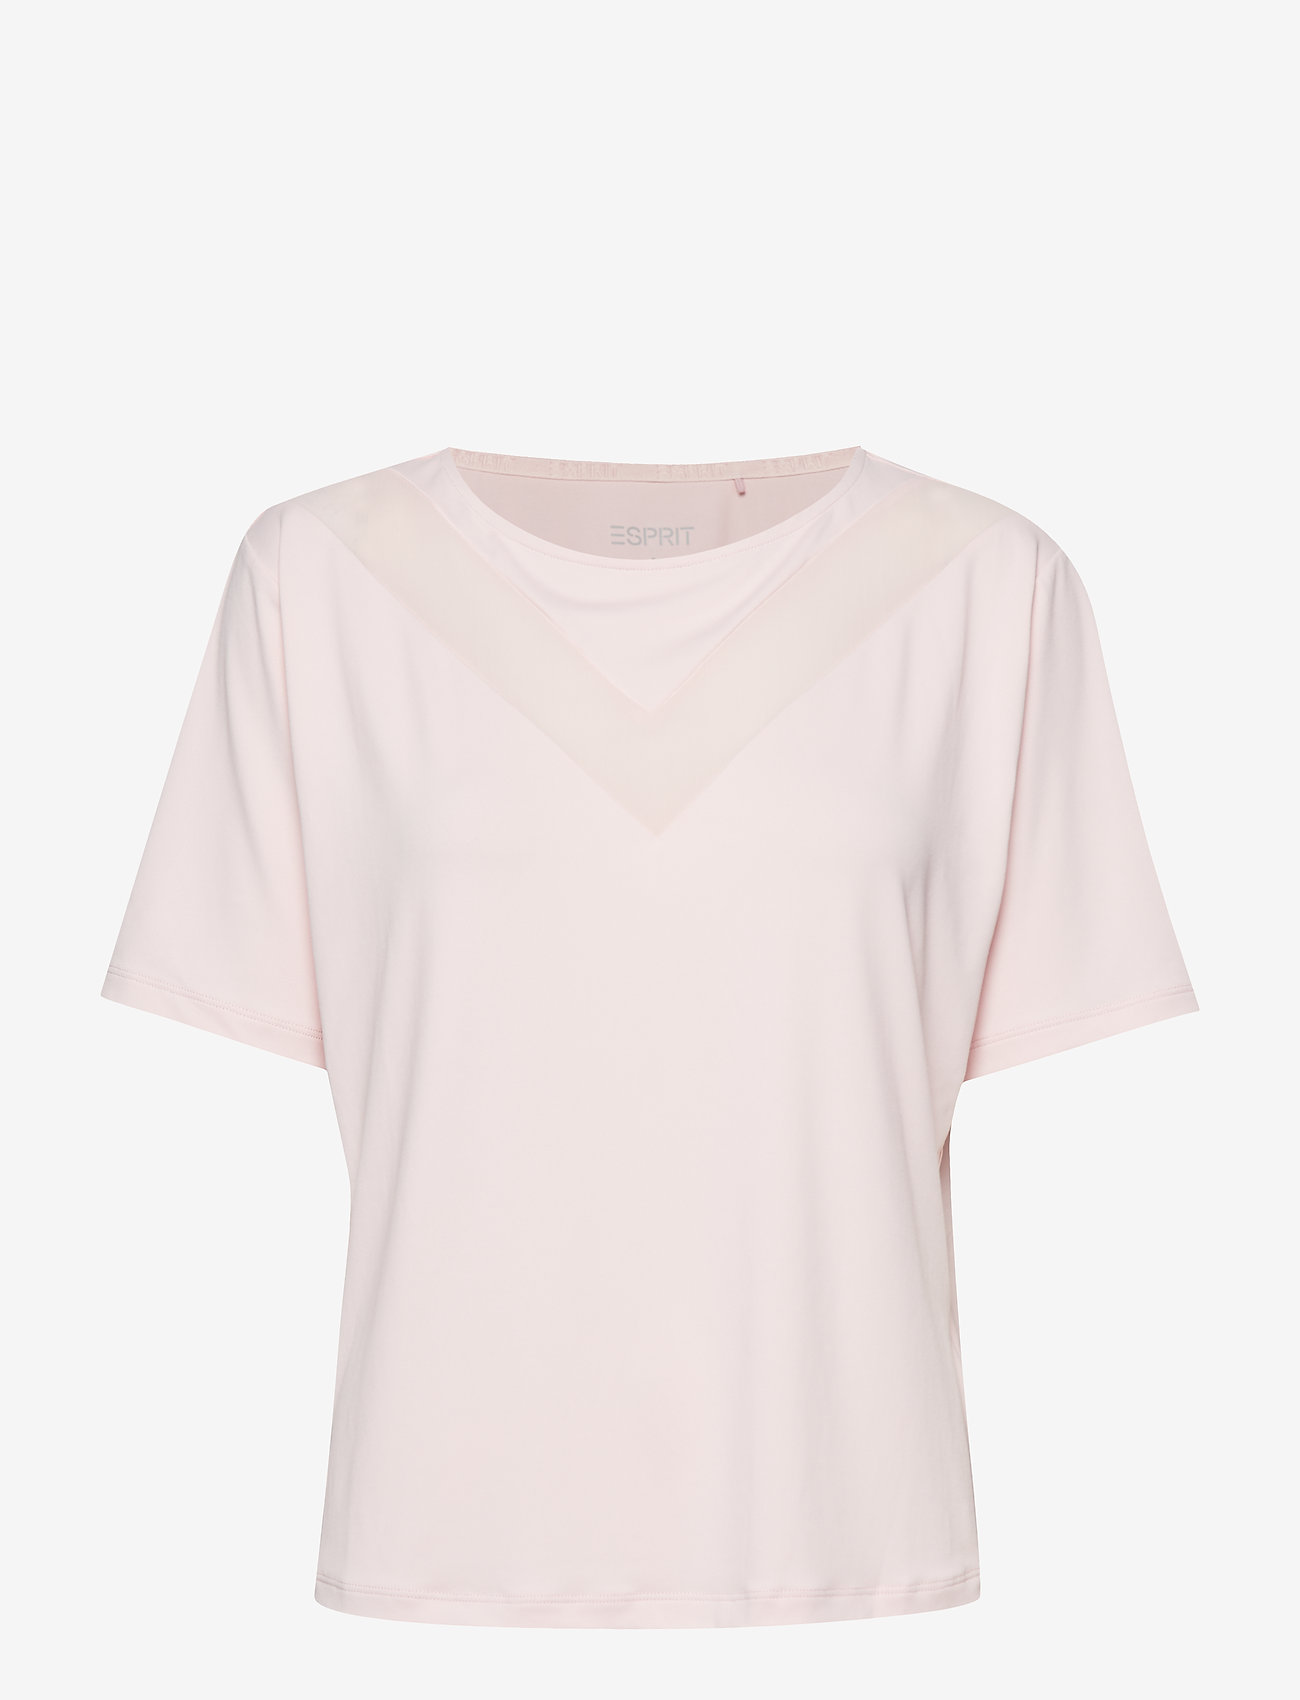 Esprit Sport - T-Shirts - t-shirts - light pink - 0